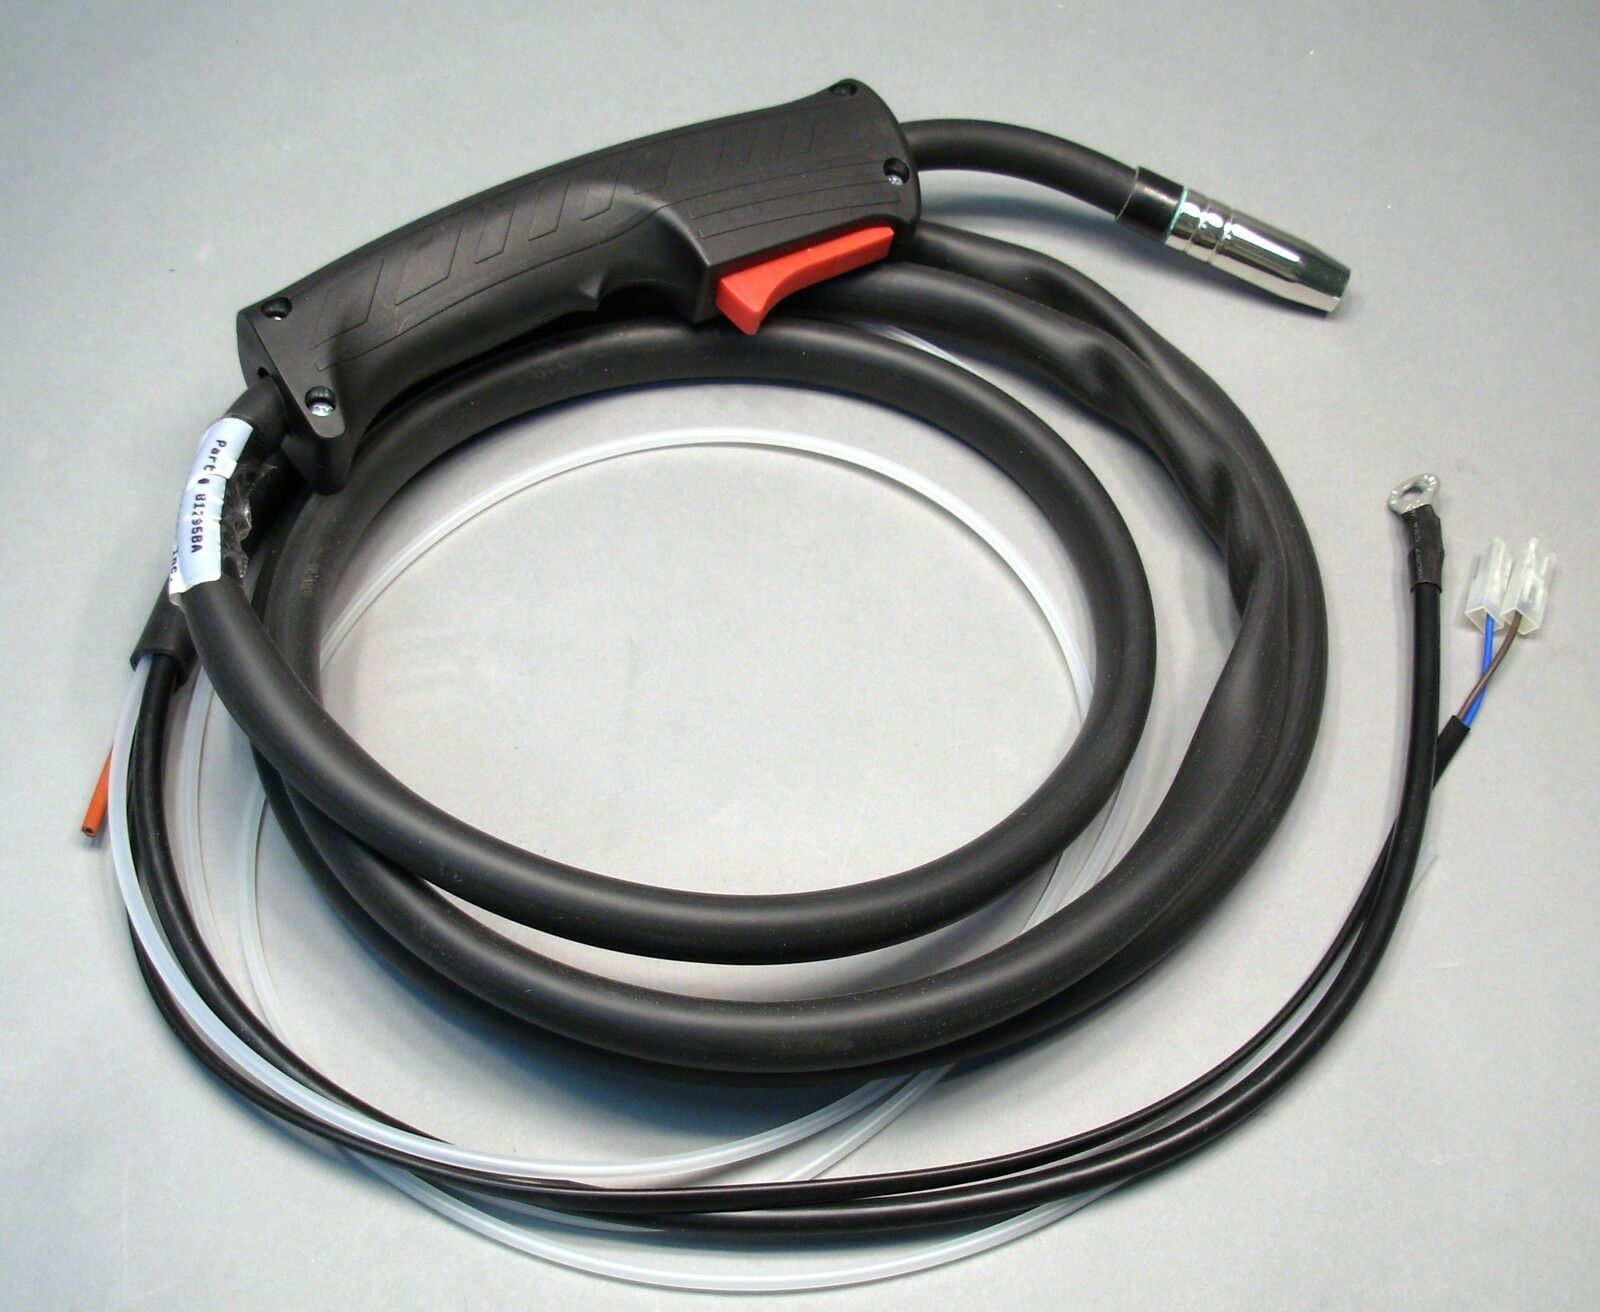 Astro Mig Welder Complete Replacement Mig Welding Gun Parts Torch Stinger